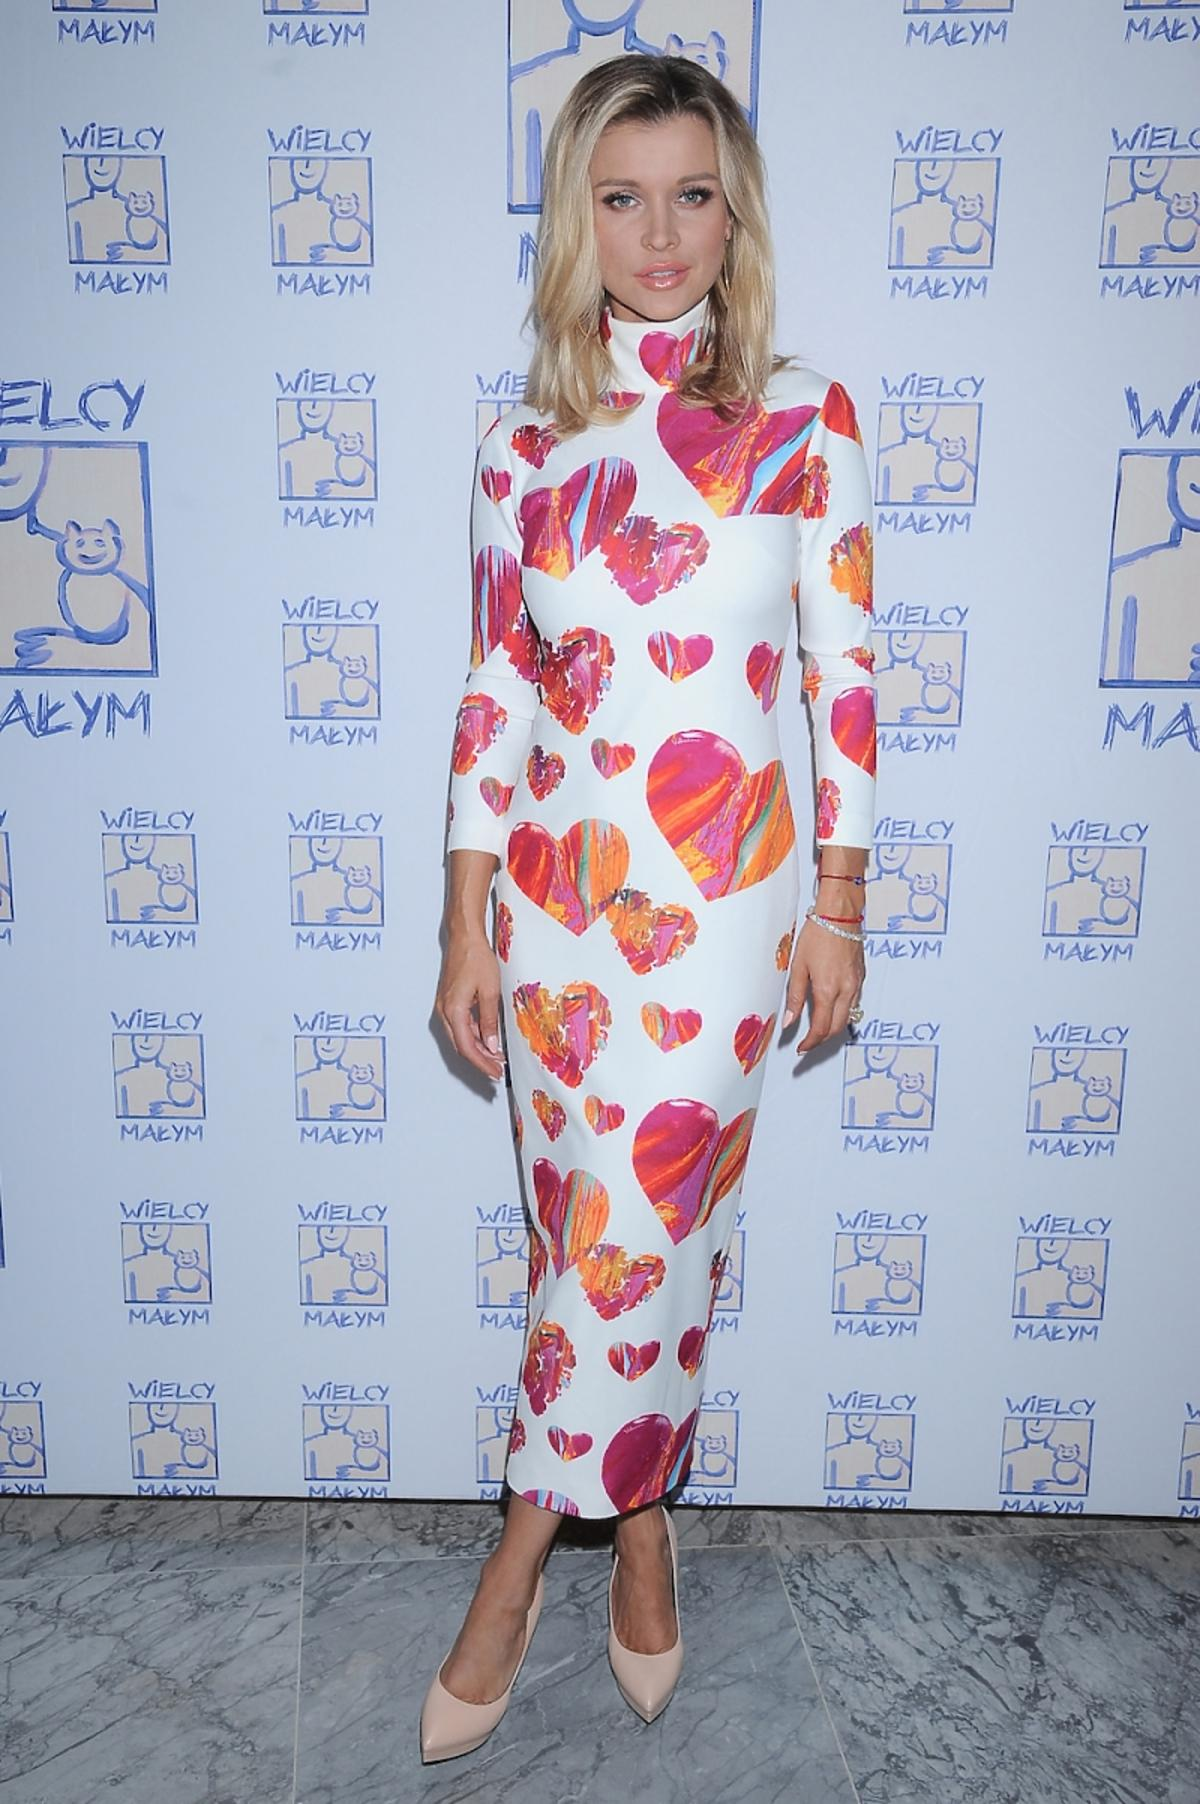 Joanna Krupa w sukience w serca